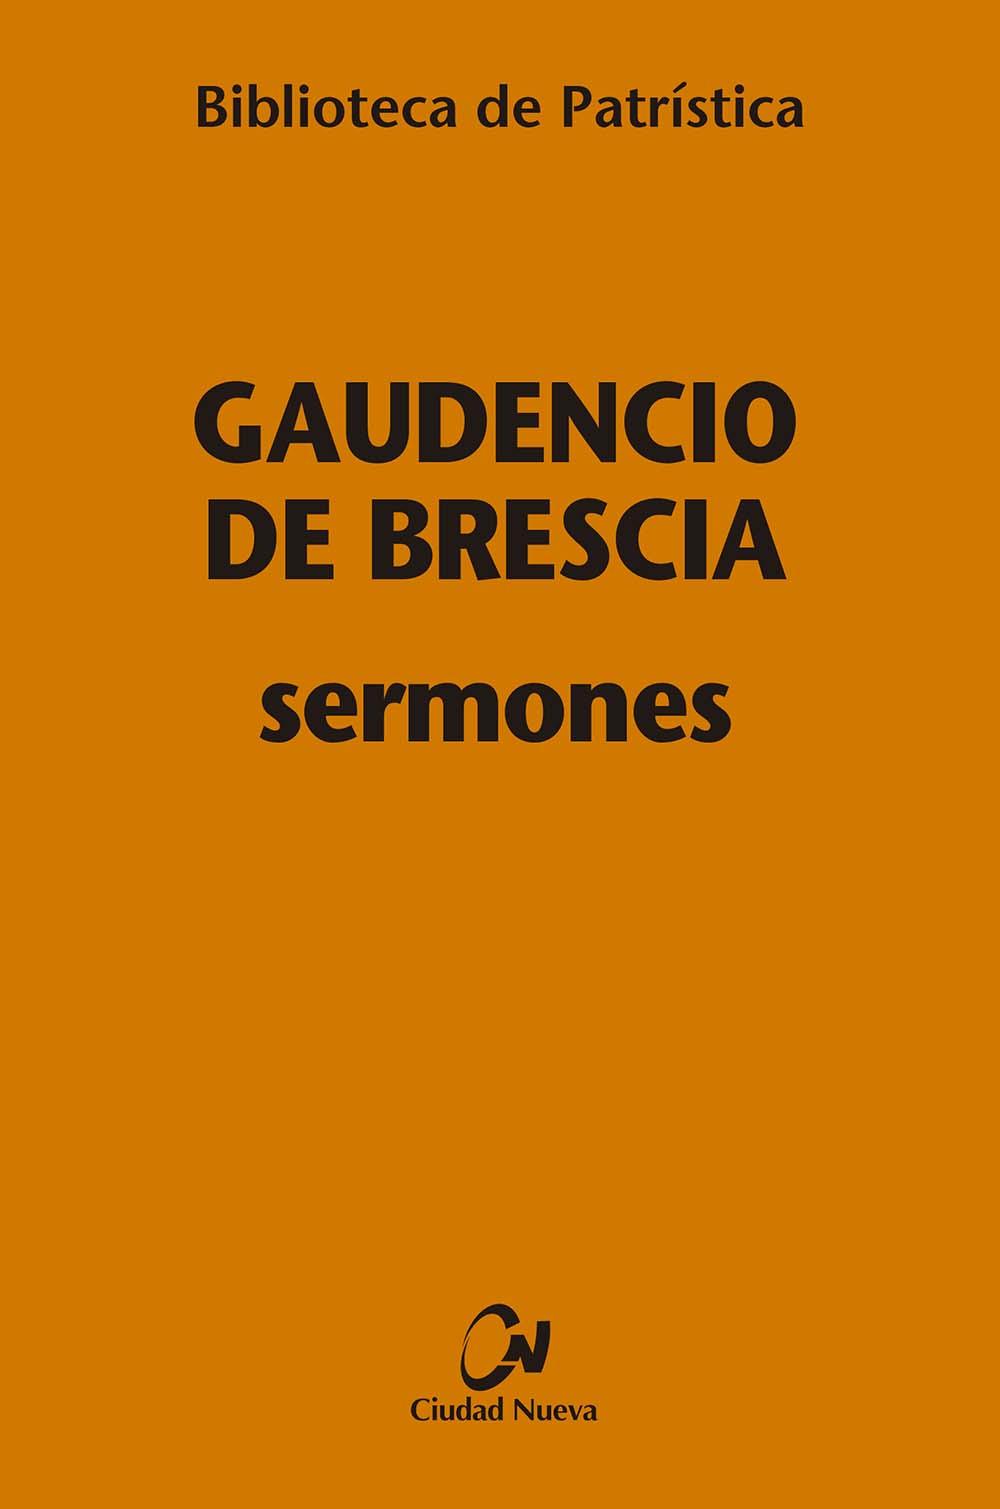 sermones-[bpa-105]